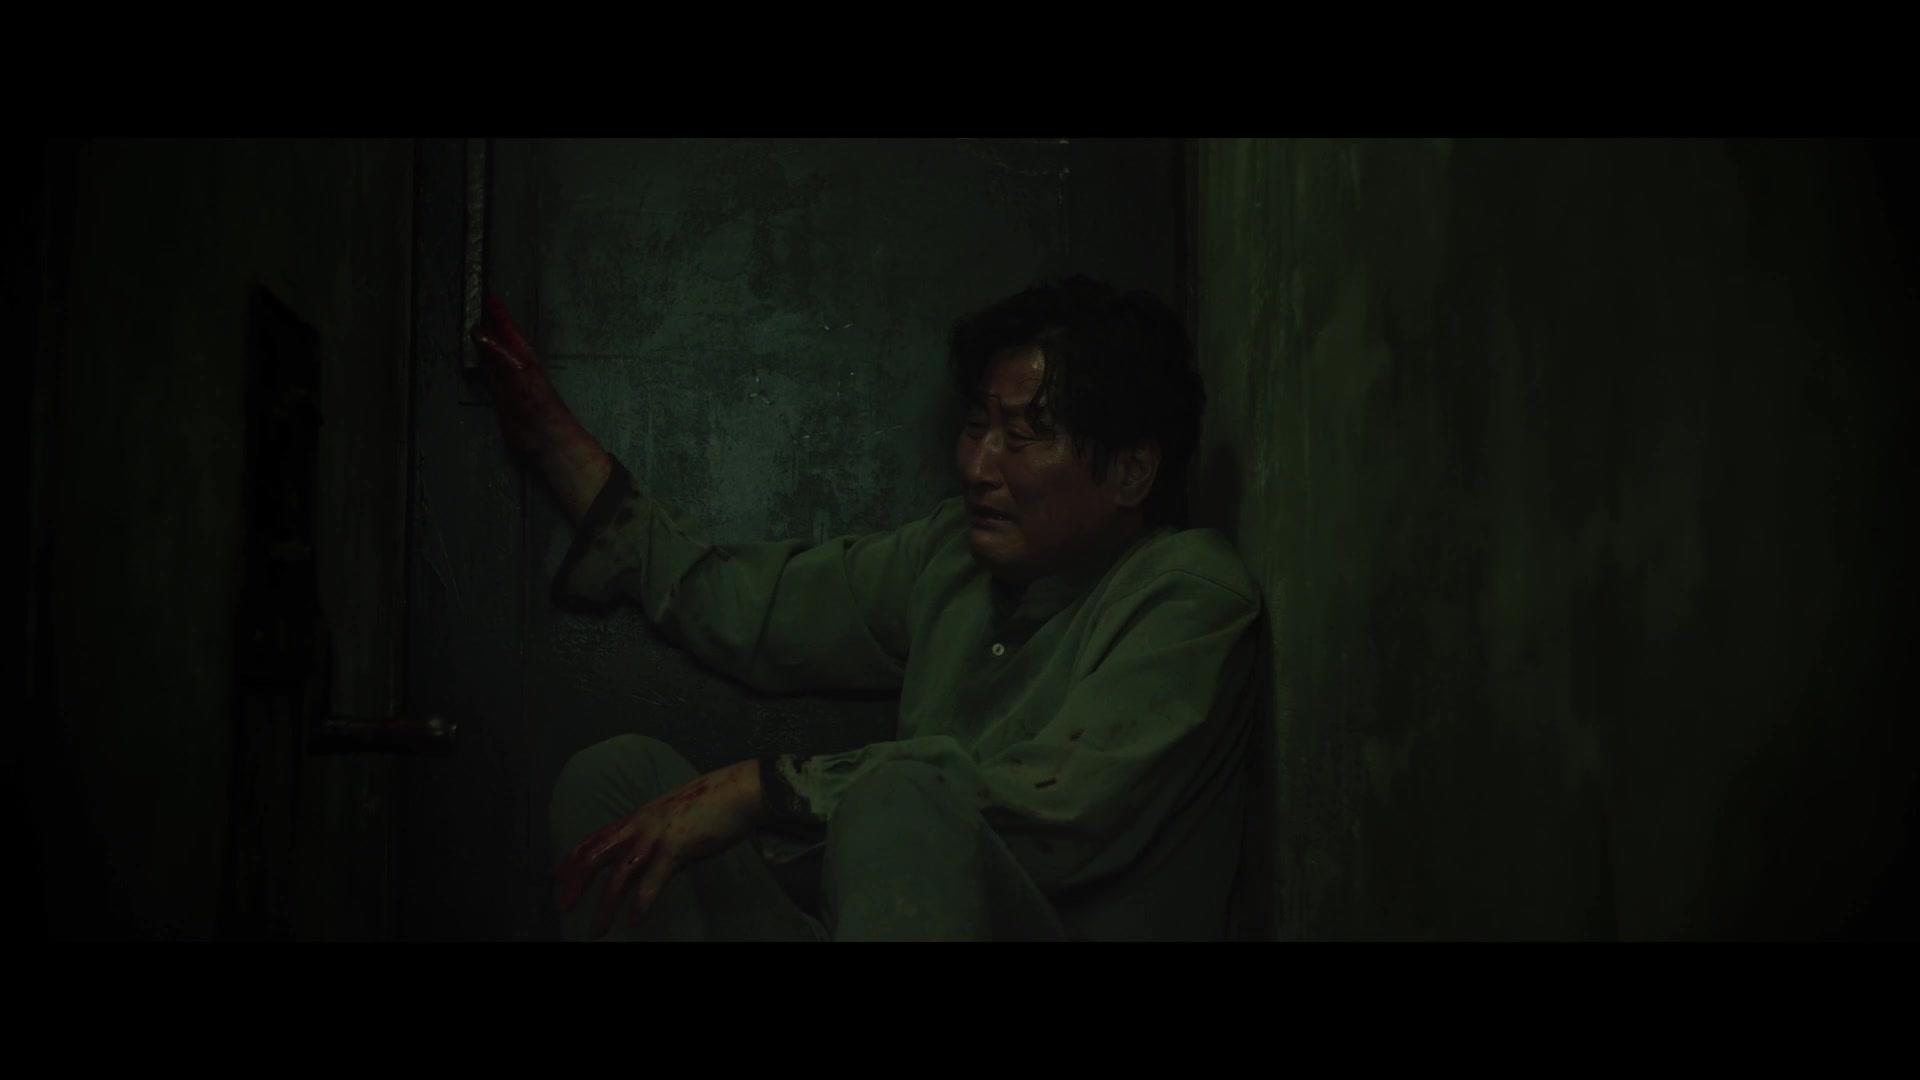 Parasitos [2019][BD-Rip][1080p][Castellano-Coreano][Drama]